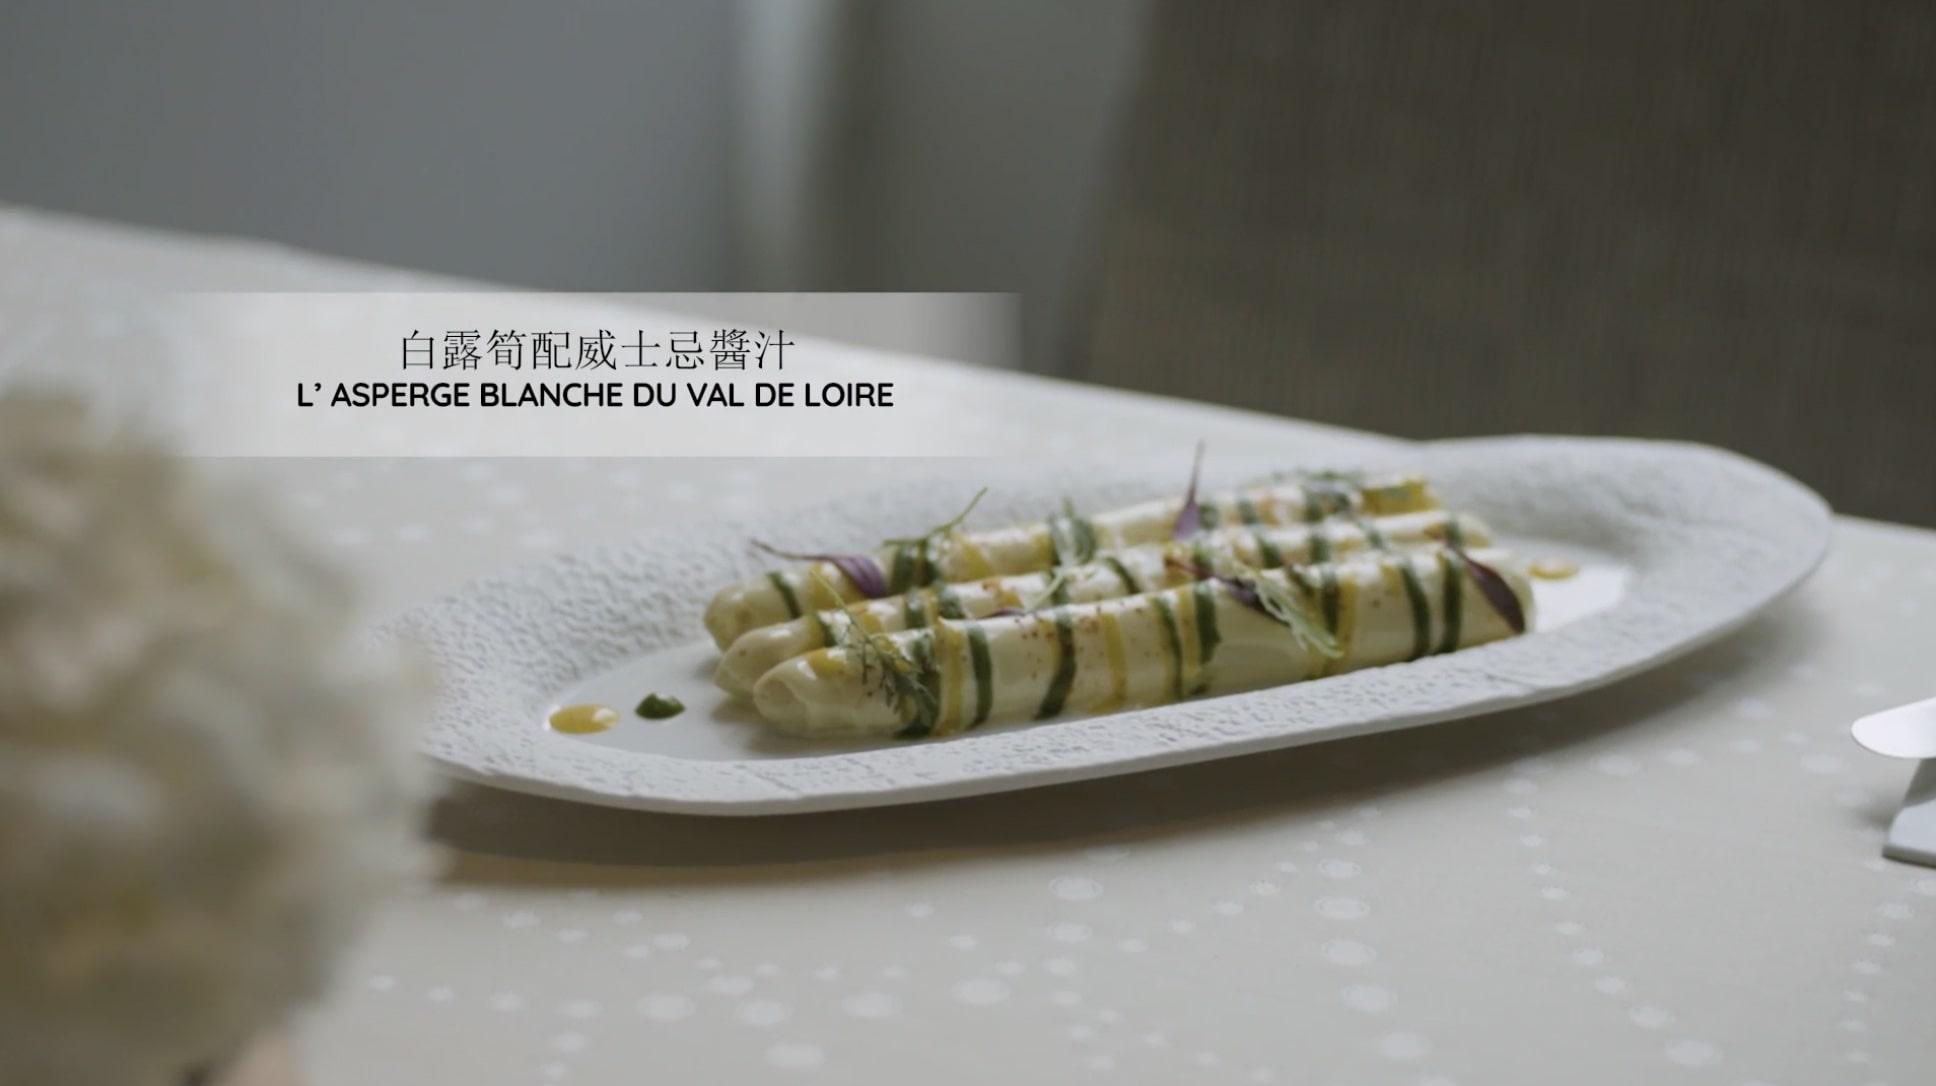 Warm French white asparagus & single malt Islay dressing